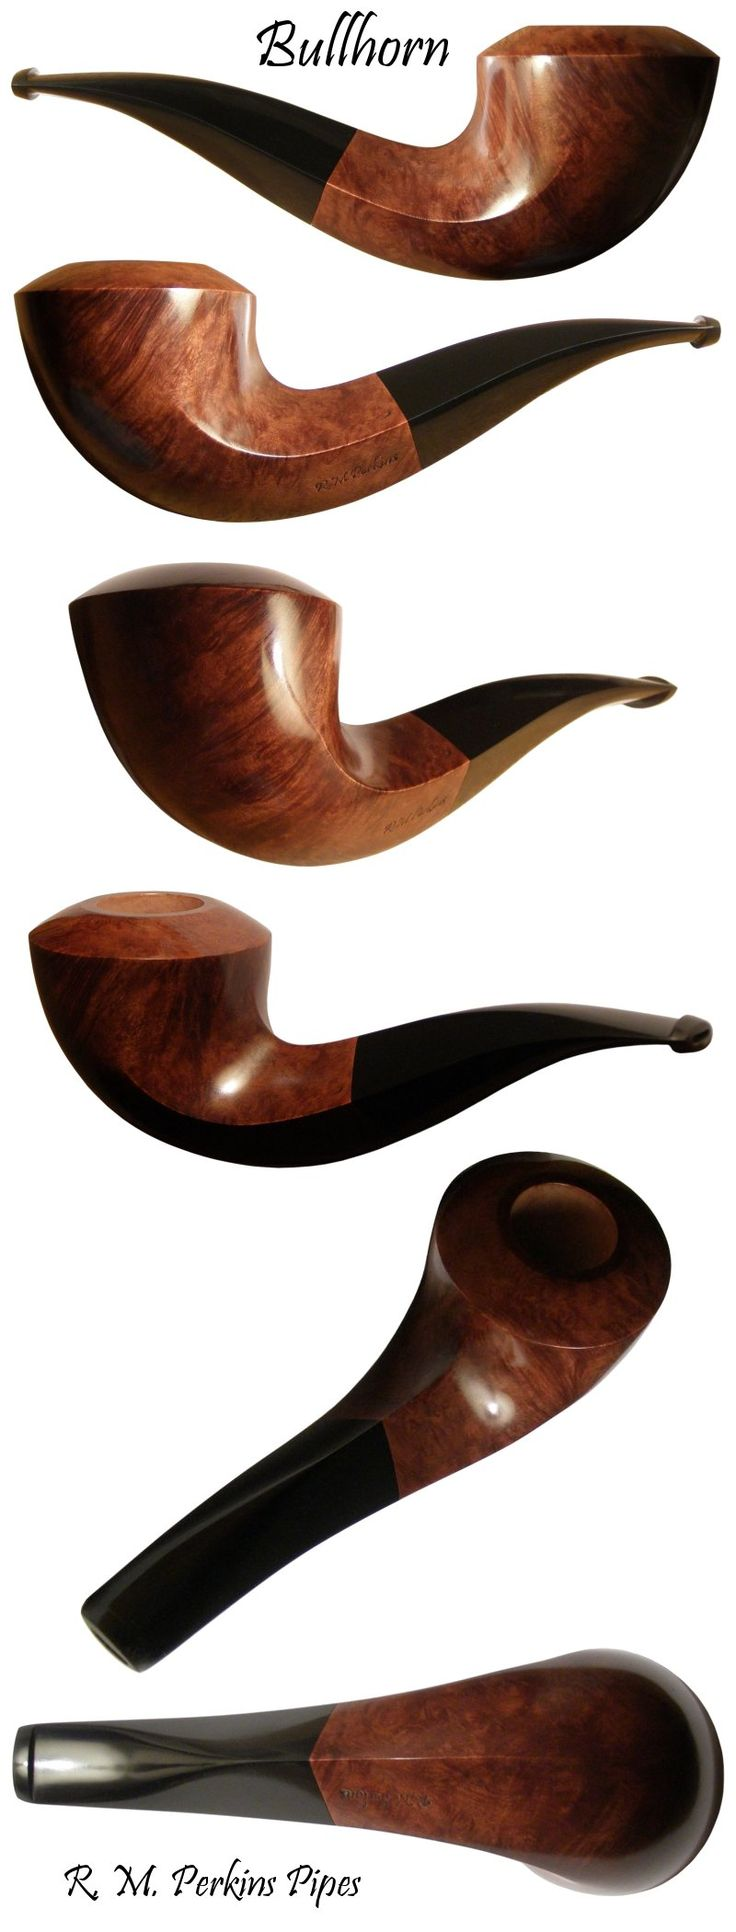 Handmade Bullhorn tobacco smoking pipe